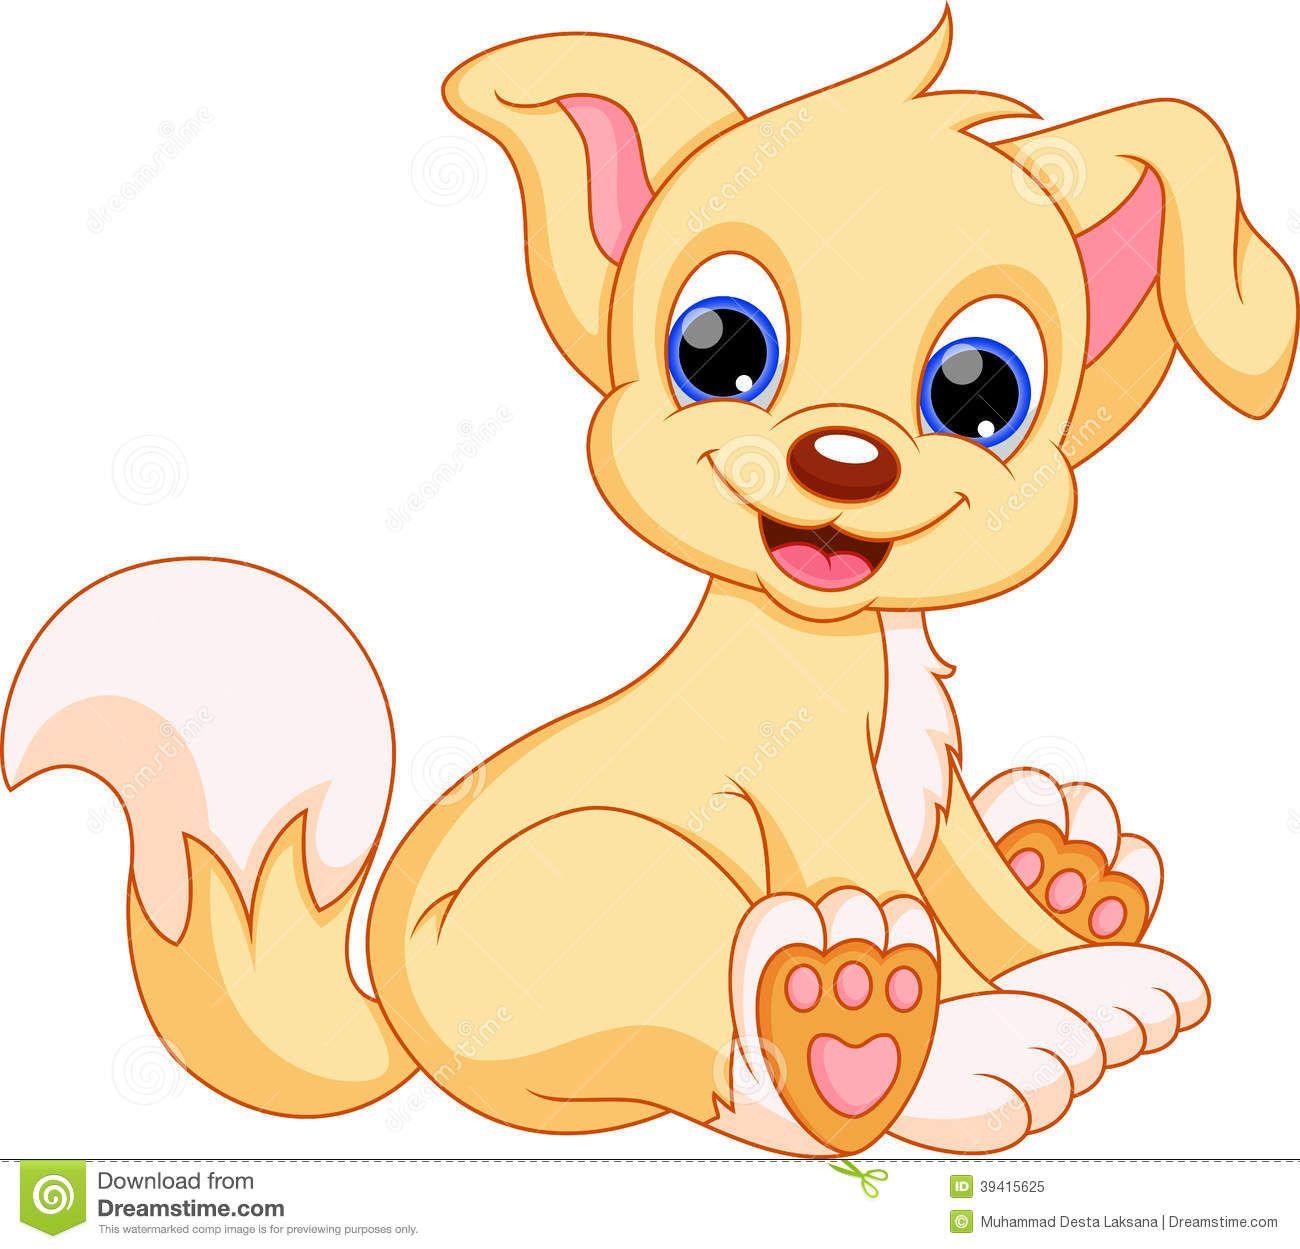 Pin By Gowri Maharajan On Puppy Dogs Cute Dog Cartoon Puppy Cartoon Cute Dog Wallpaper